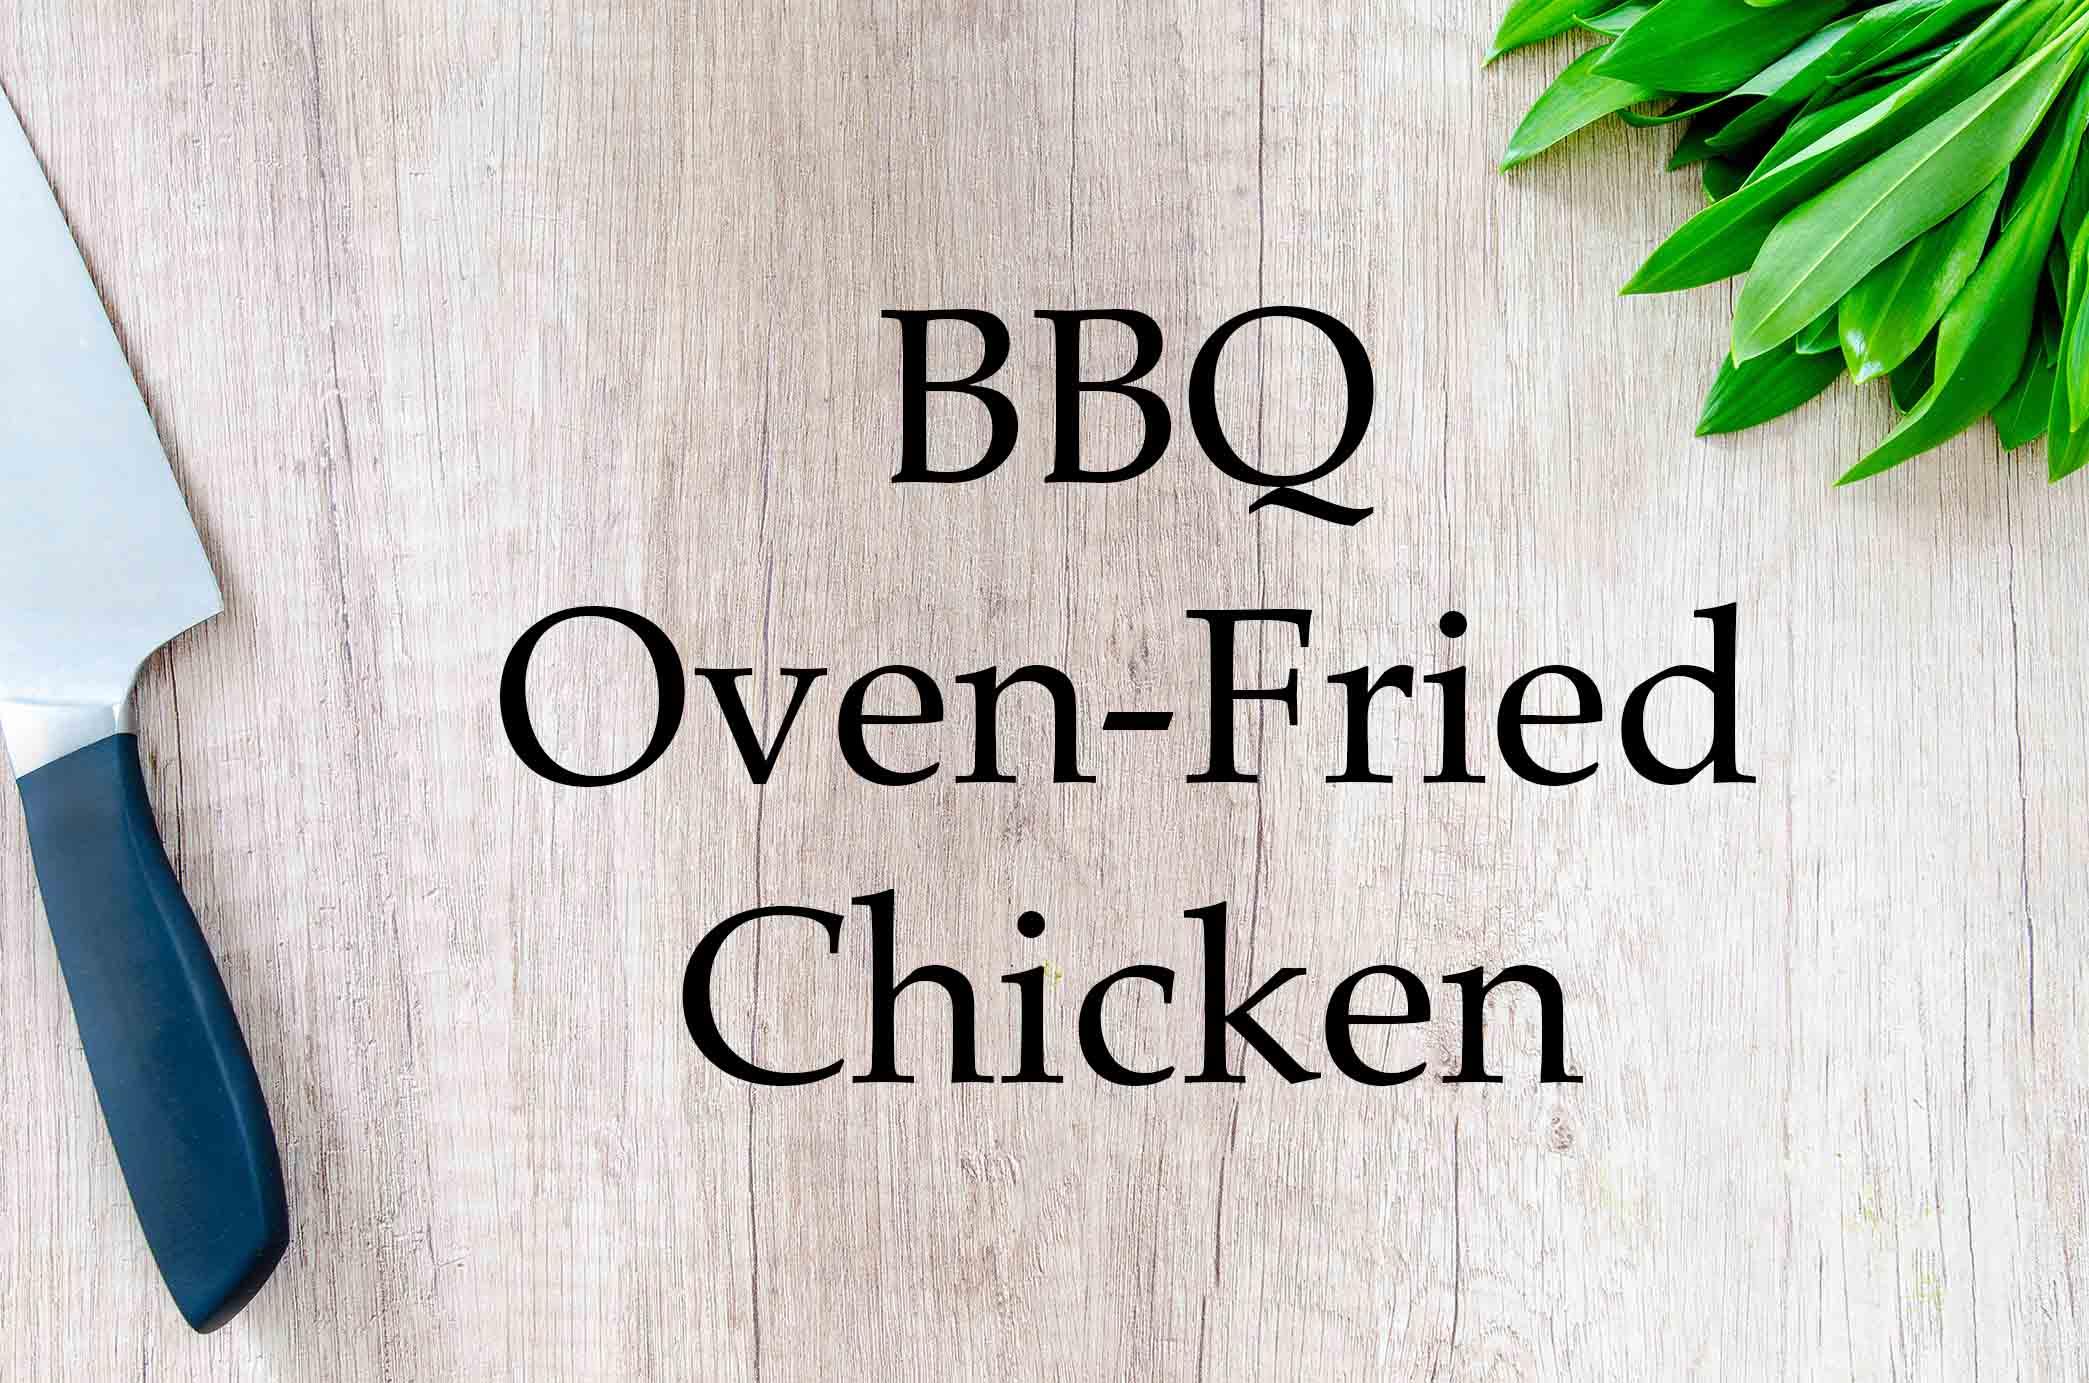 GrannyKeto.com Recipes: BBQ Oven-Fried Chicken